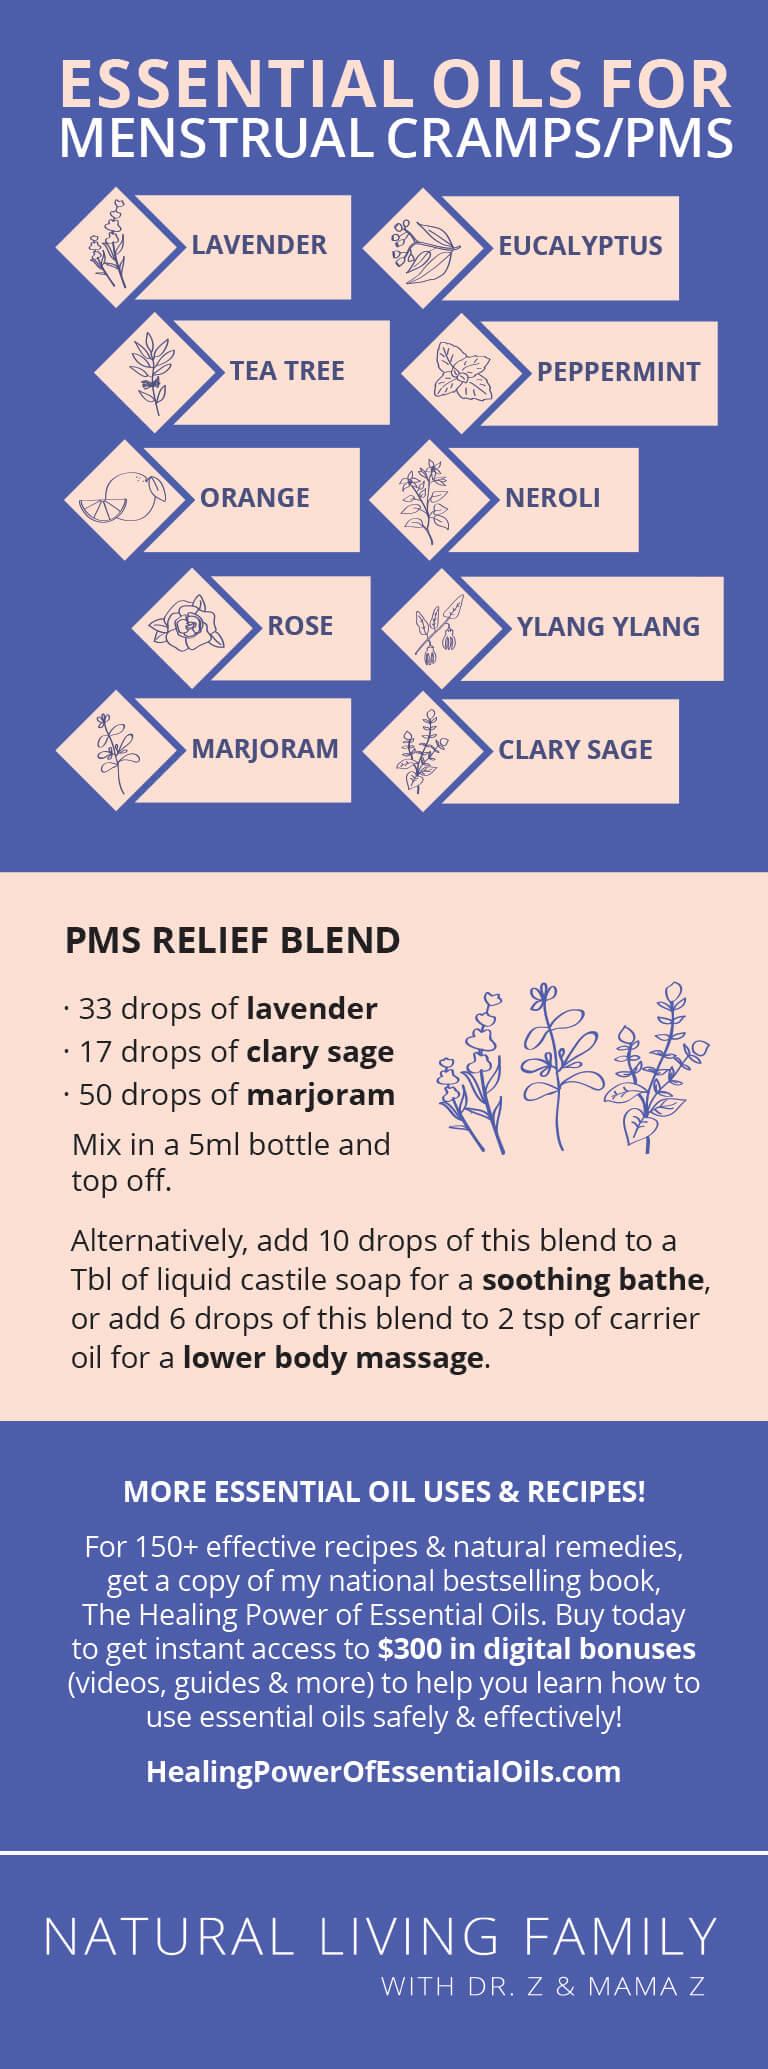 Essential Oils for Menstrual Cramps: The 10 Best Oils